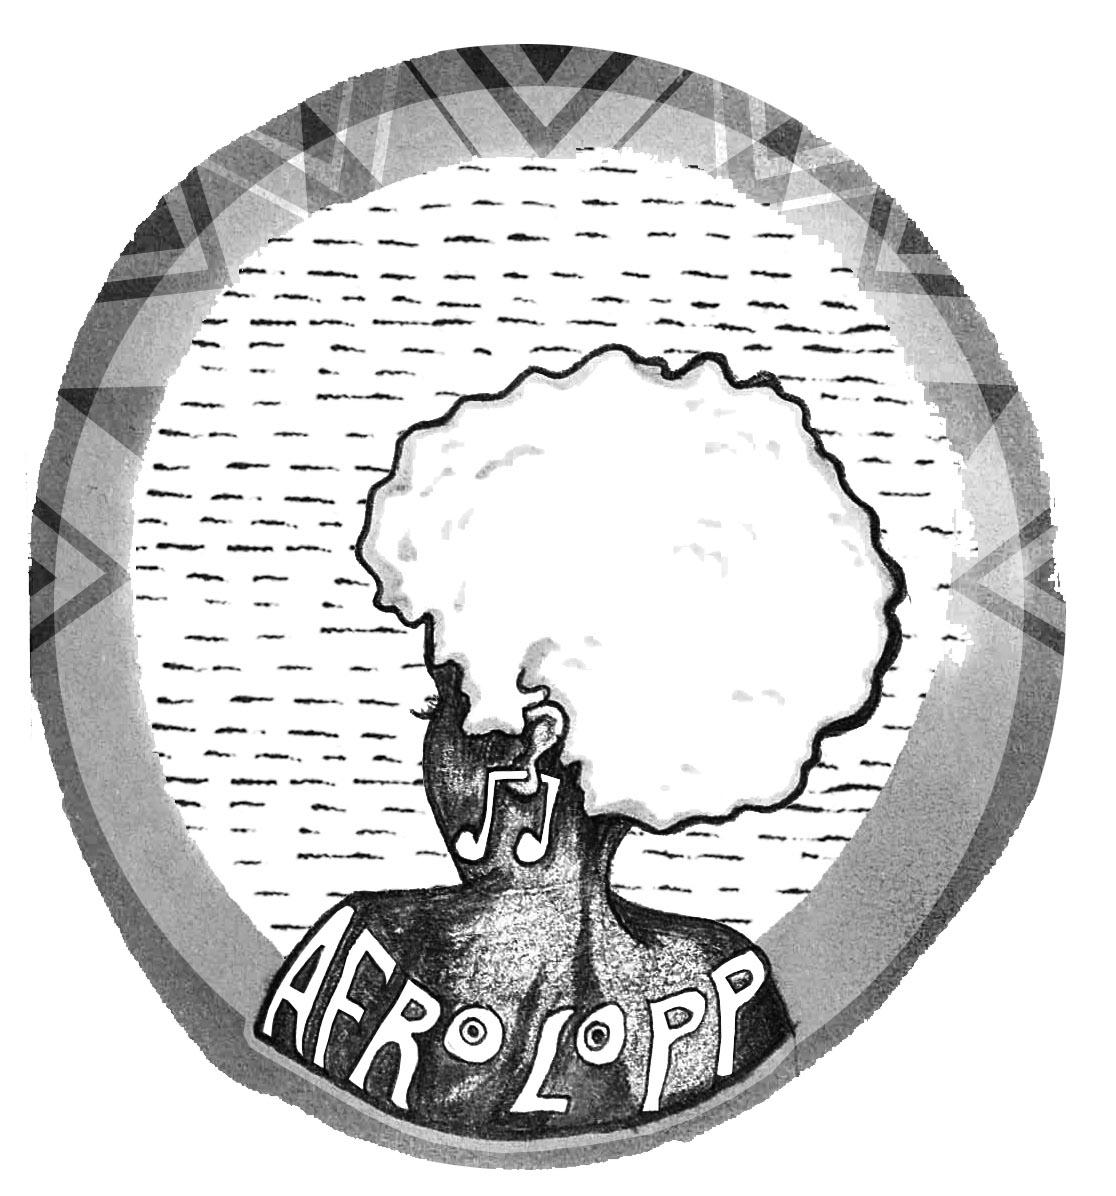 Logo, Afro loop